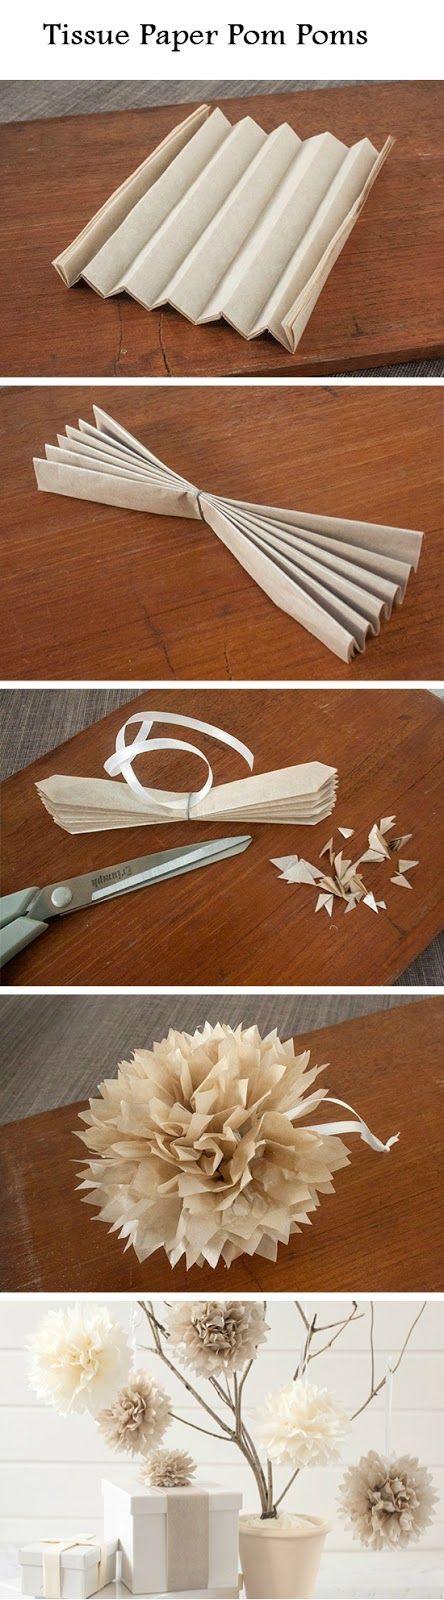 Crafts and DIY Community: Easy Tissue Paper Pom Poms